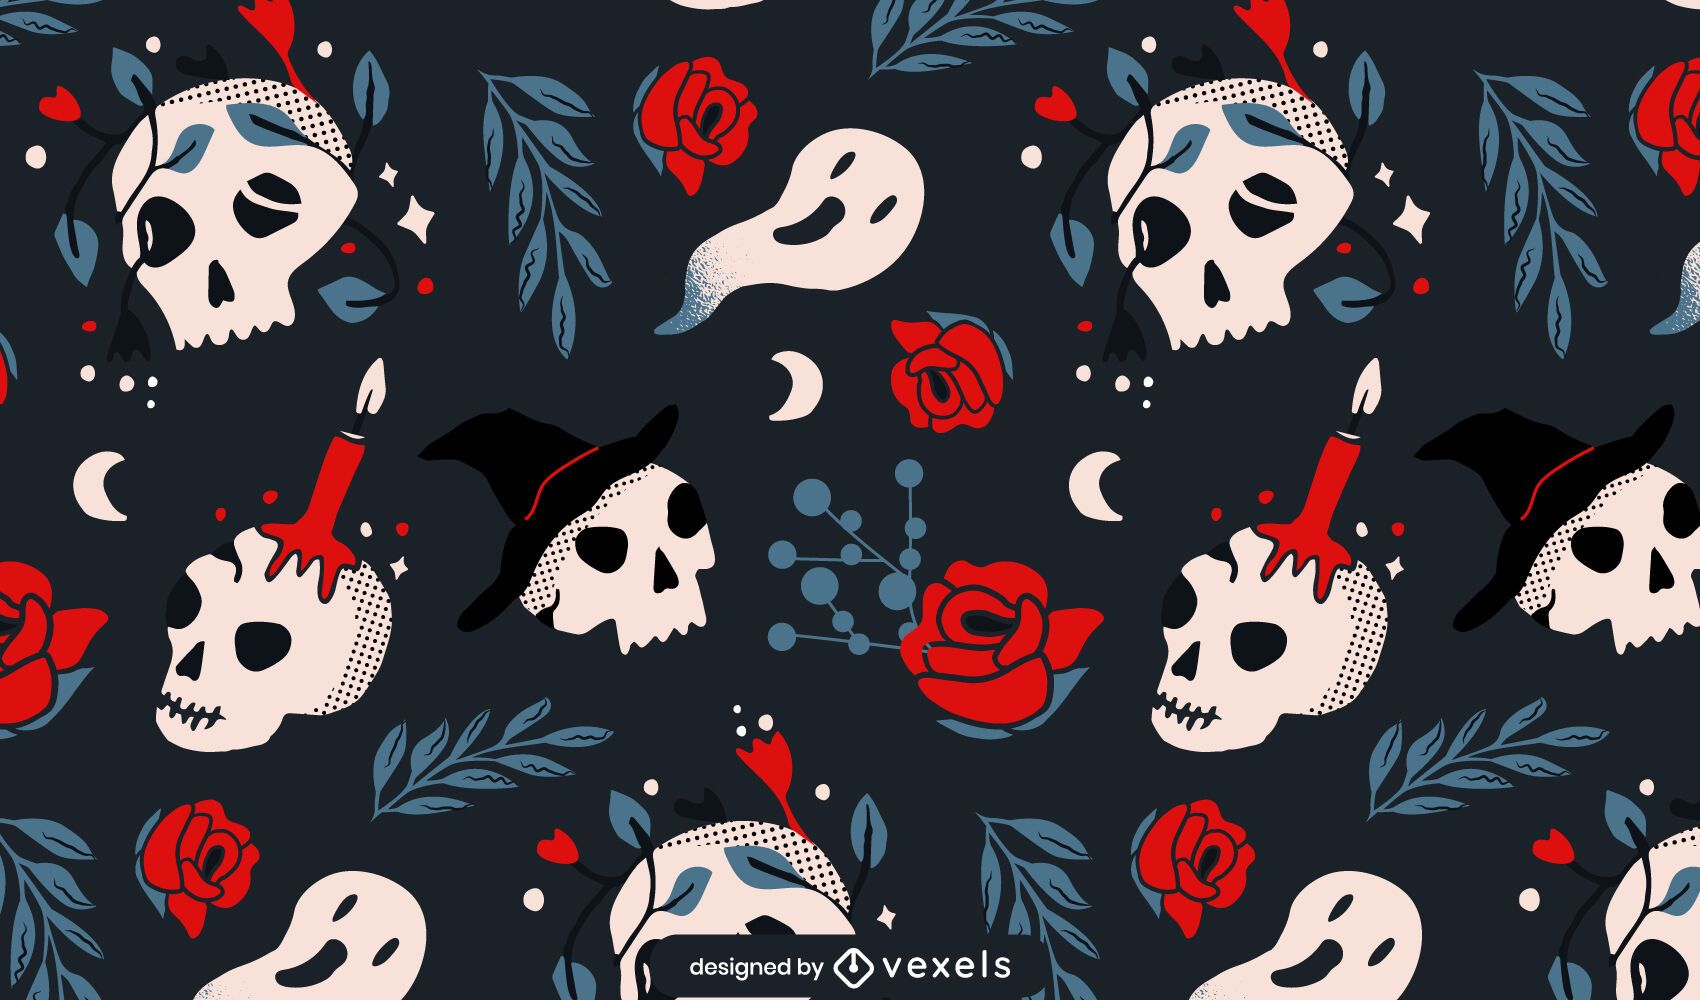 Patrón de rosas de calaveras de Halloween